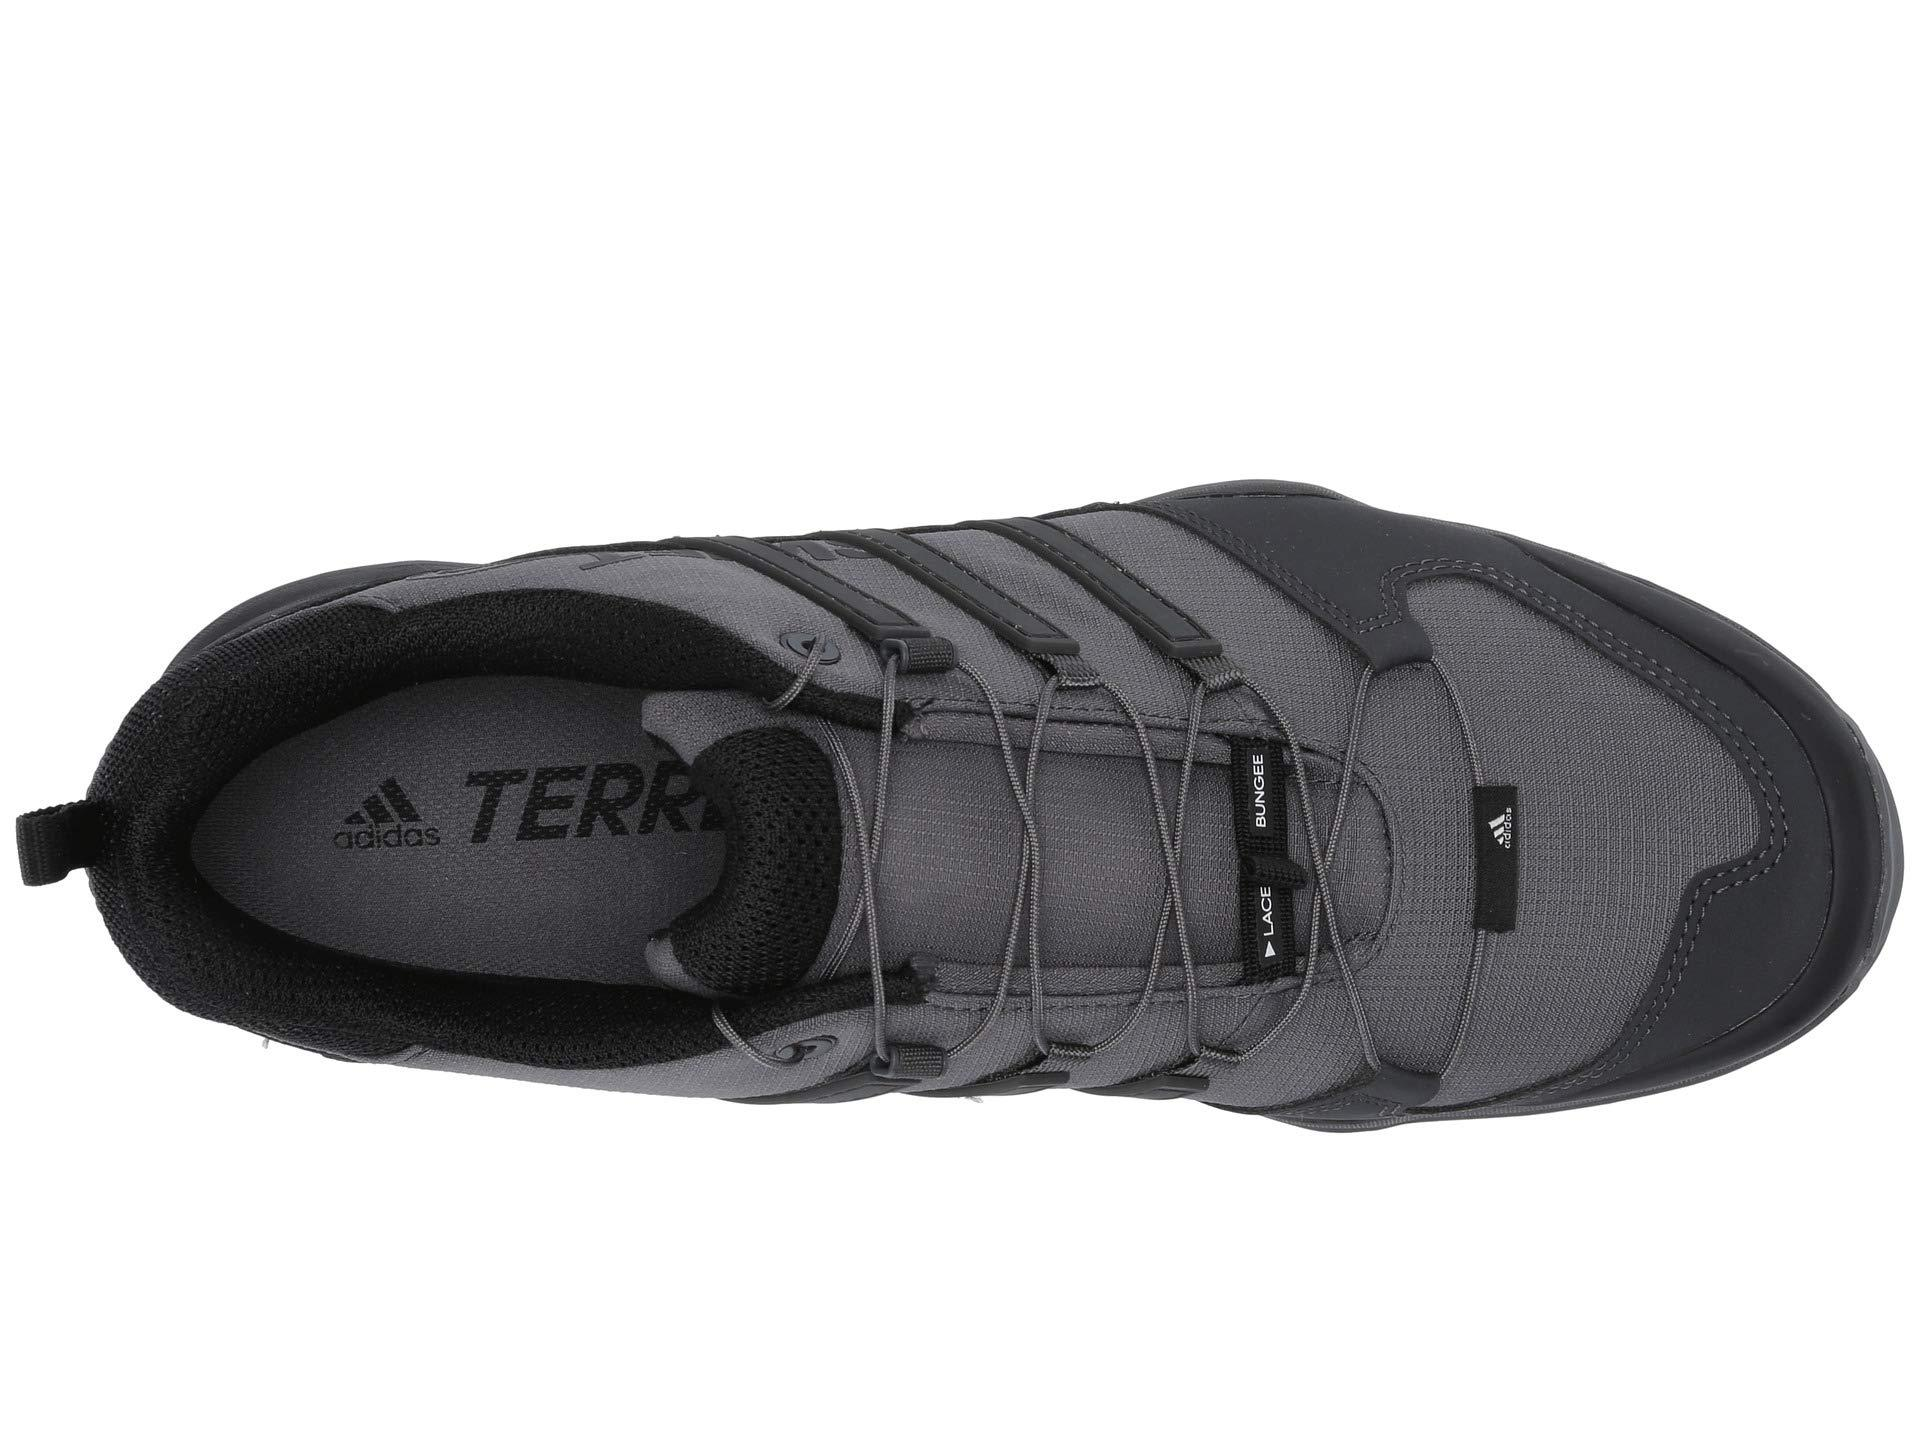 newest 93fda 18fdf Adidas Originals - Black Terrex Swift R2 (grey Six carbon grey Five). View  fullscreen